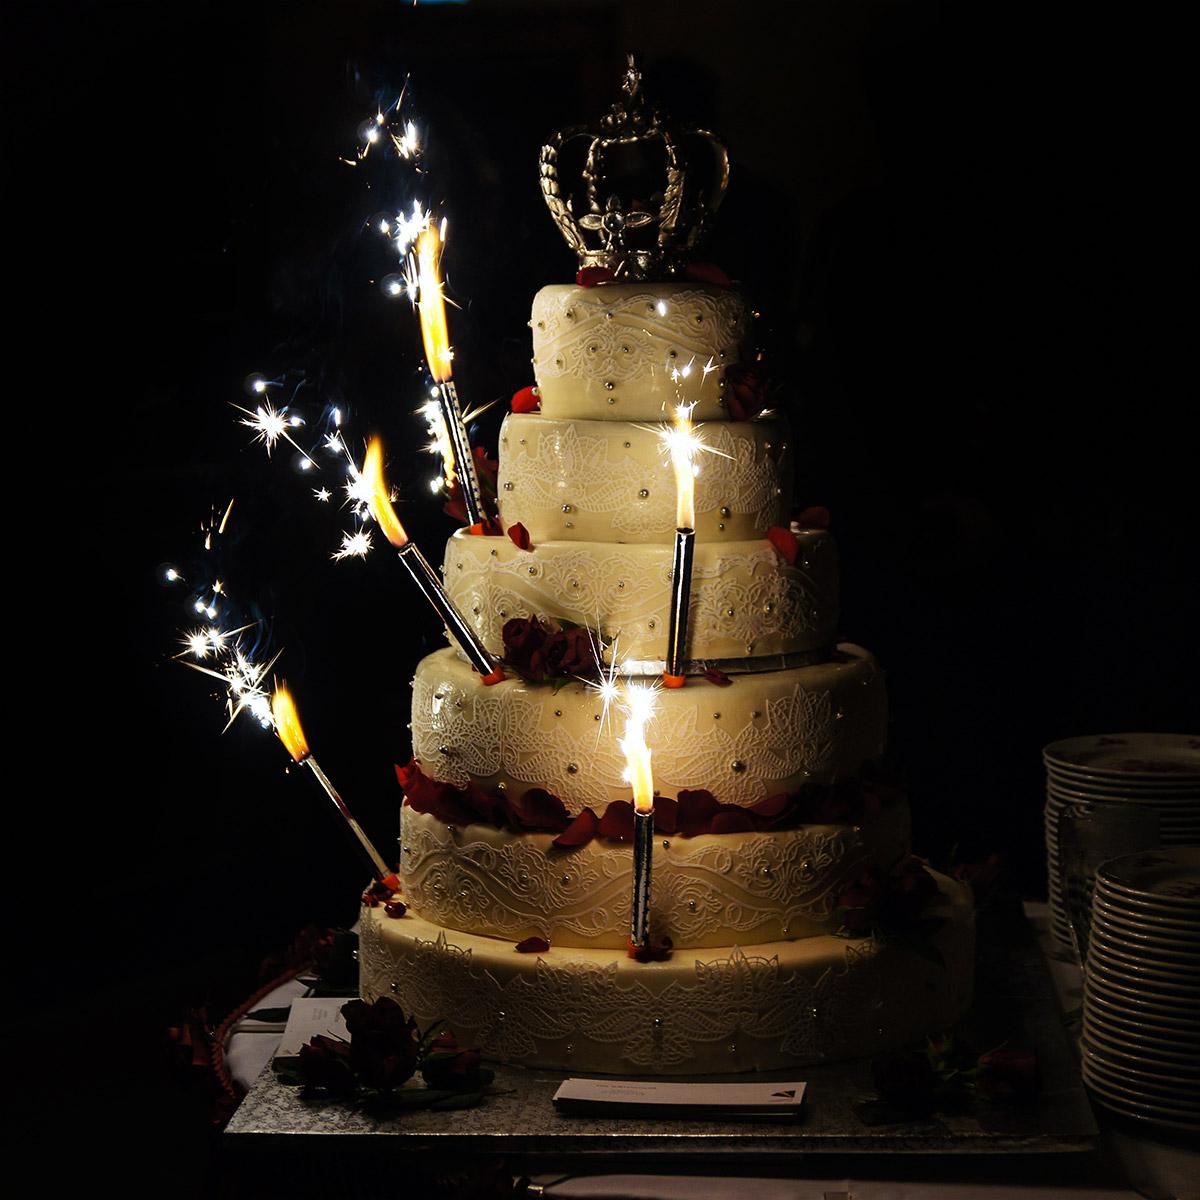 Wedding Sparkler Photos: Ideas For Photographing Sparklers